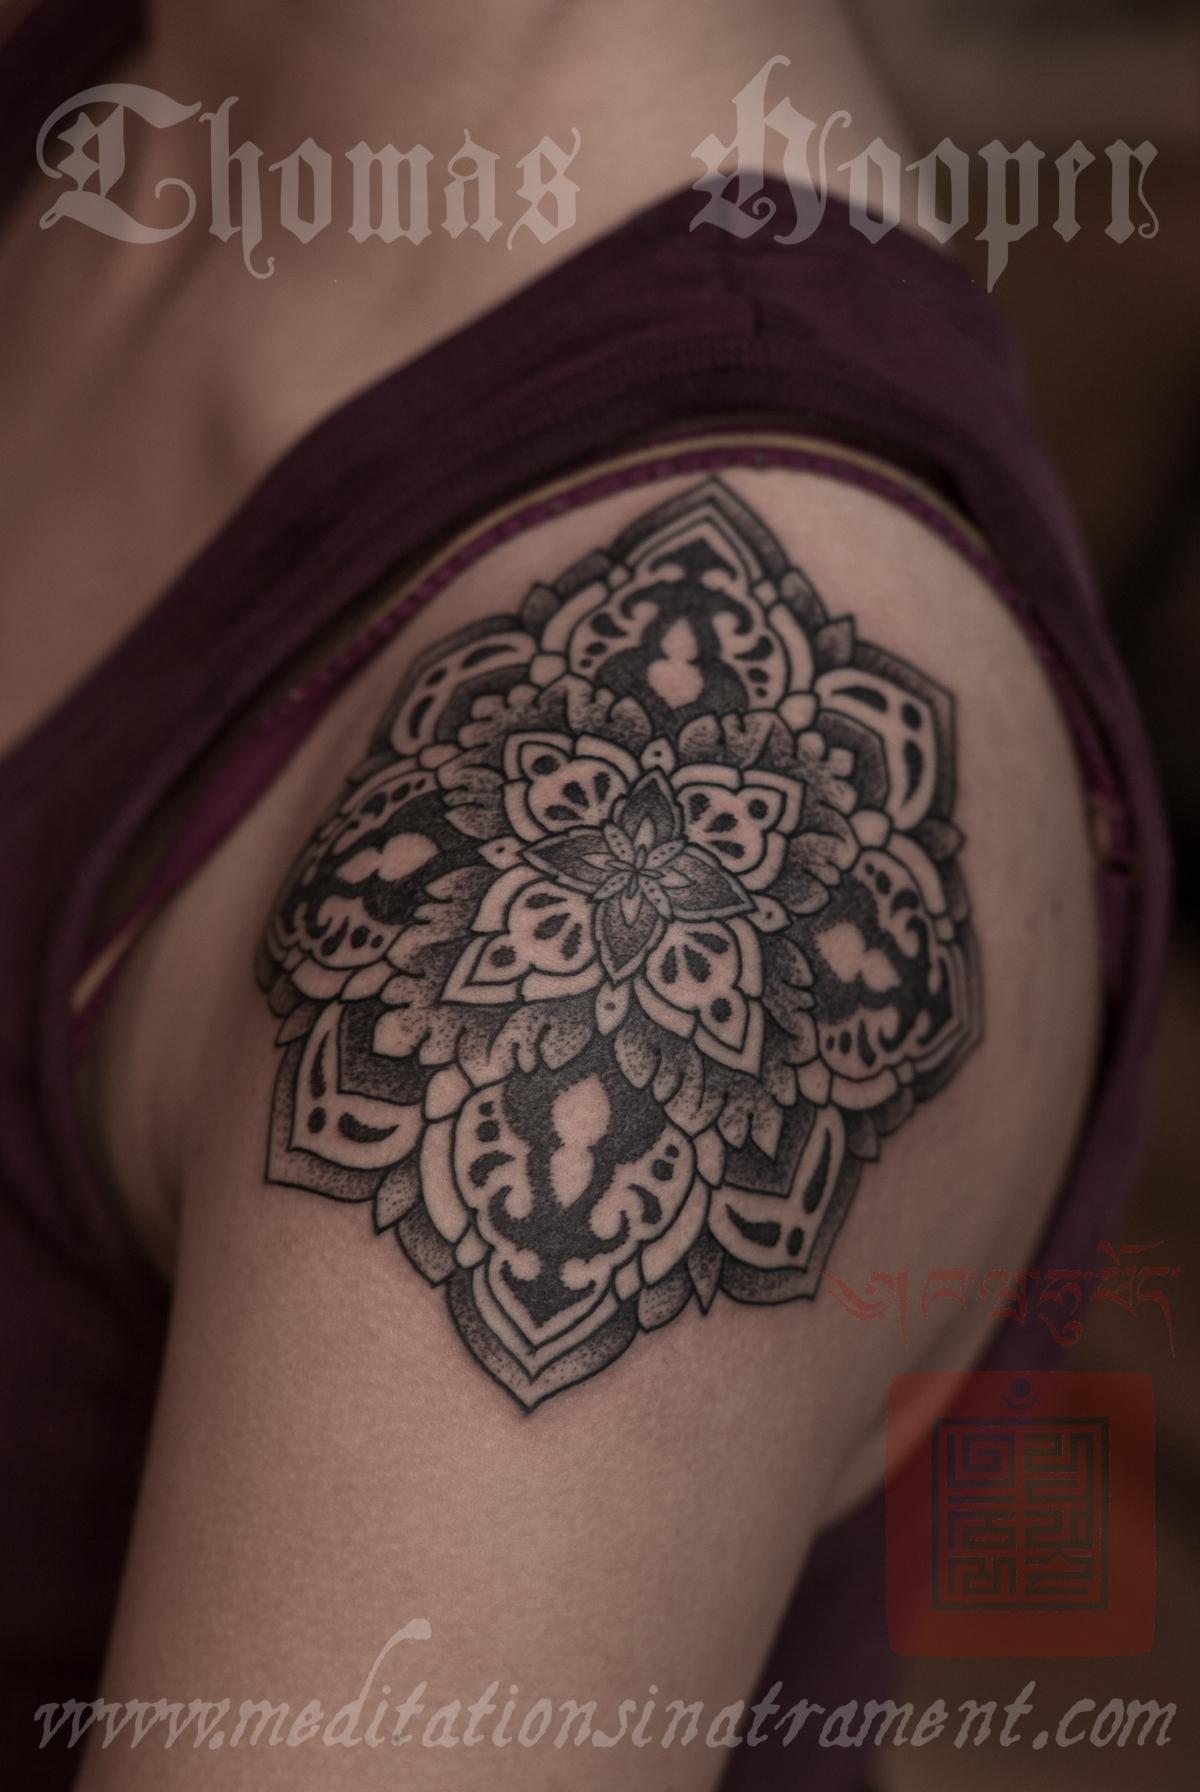 Shoulder Flower Tattoo – Tattooing By Thomas Hooper – 007 – November 09 2011